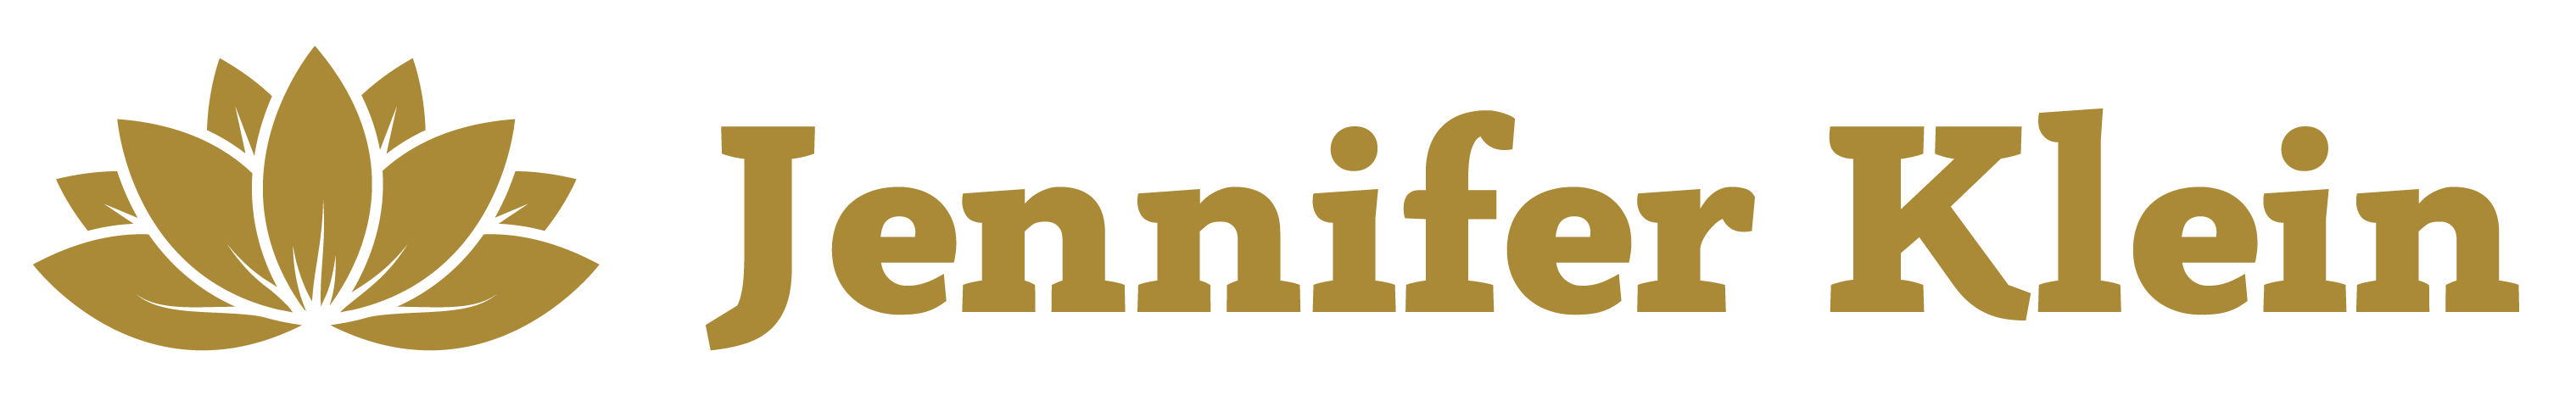 Jennifer Klein Logo